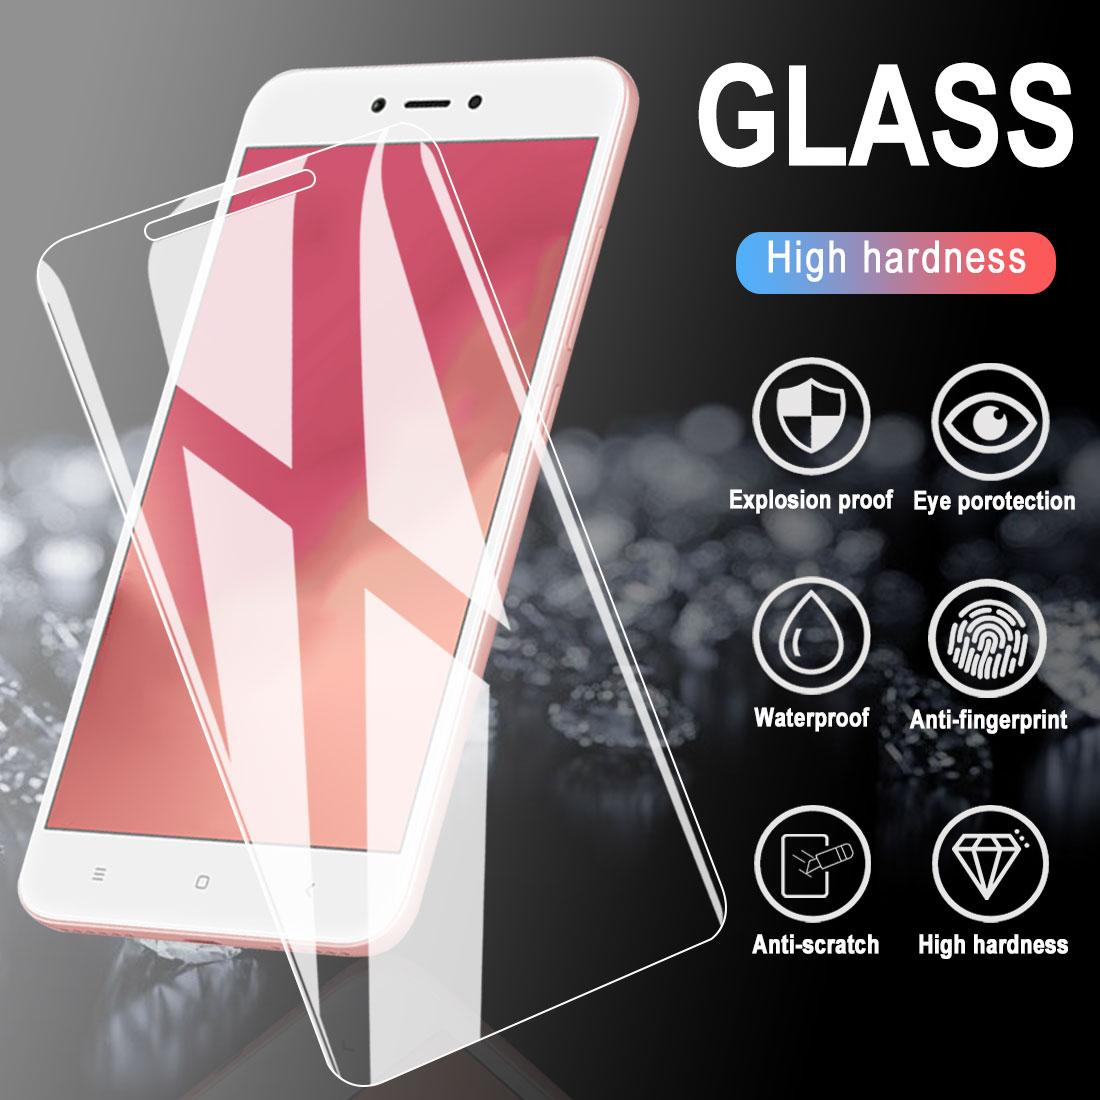 5 uds vidrio templado para Xiaomi Redmi Note 6 Pro Protector de pantalla Film para Note 4 4X5 6A vidrio para Redmi Note 5A Prime 2 3